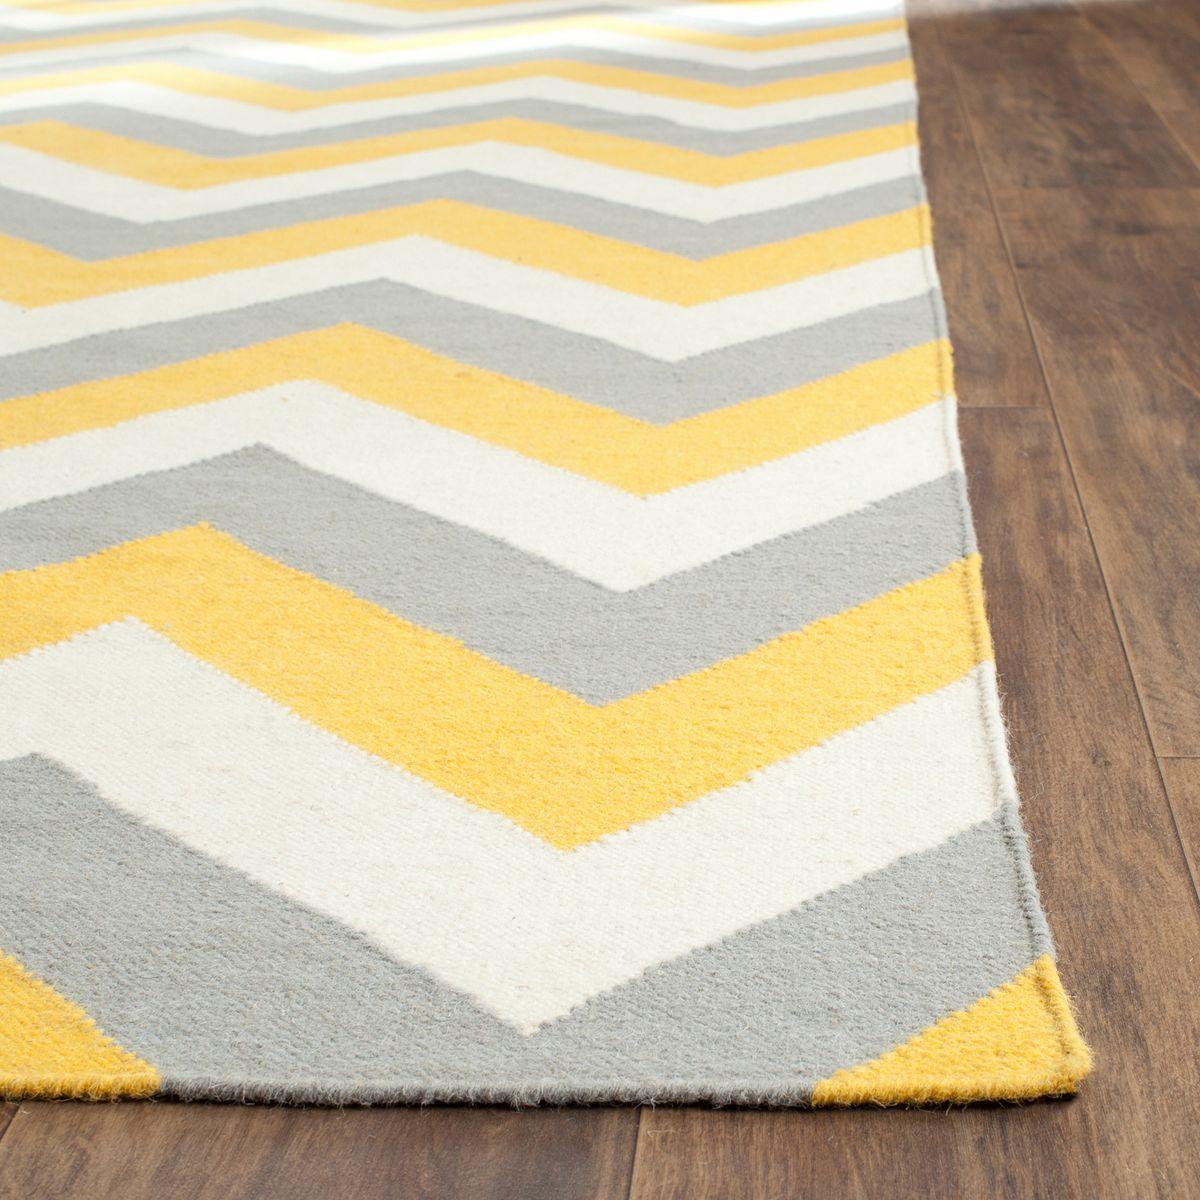 Safavieh Dhurries Chevron Handwoven Flatweave Wool Rug Gold Gray gm7xe